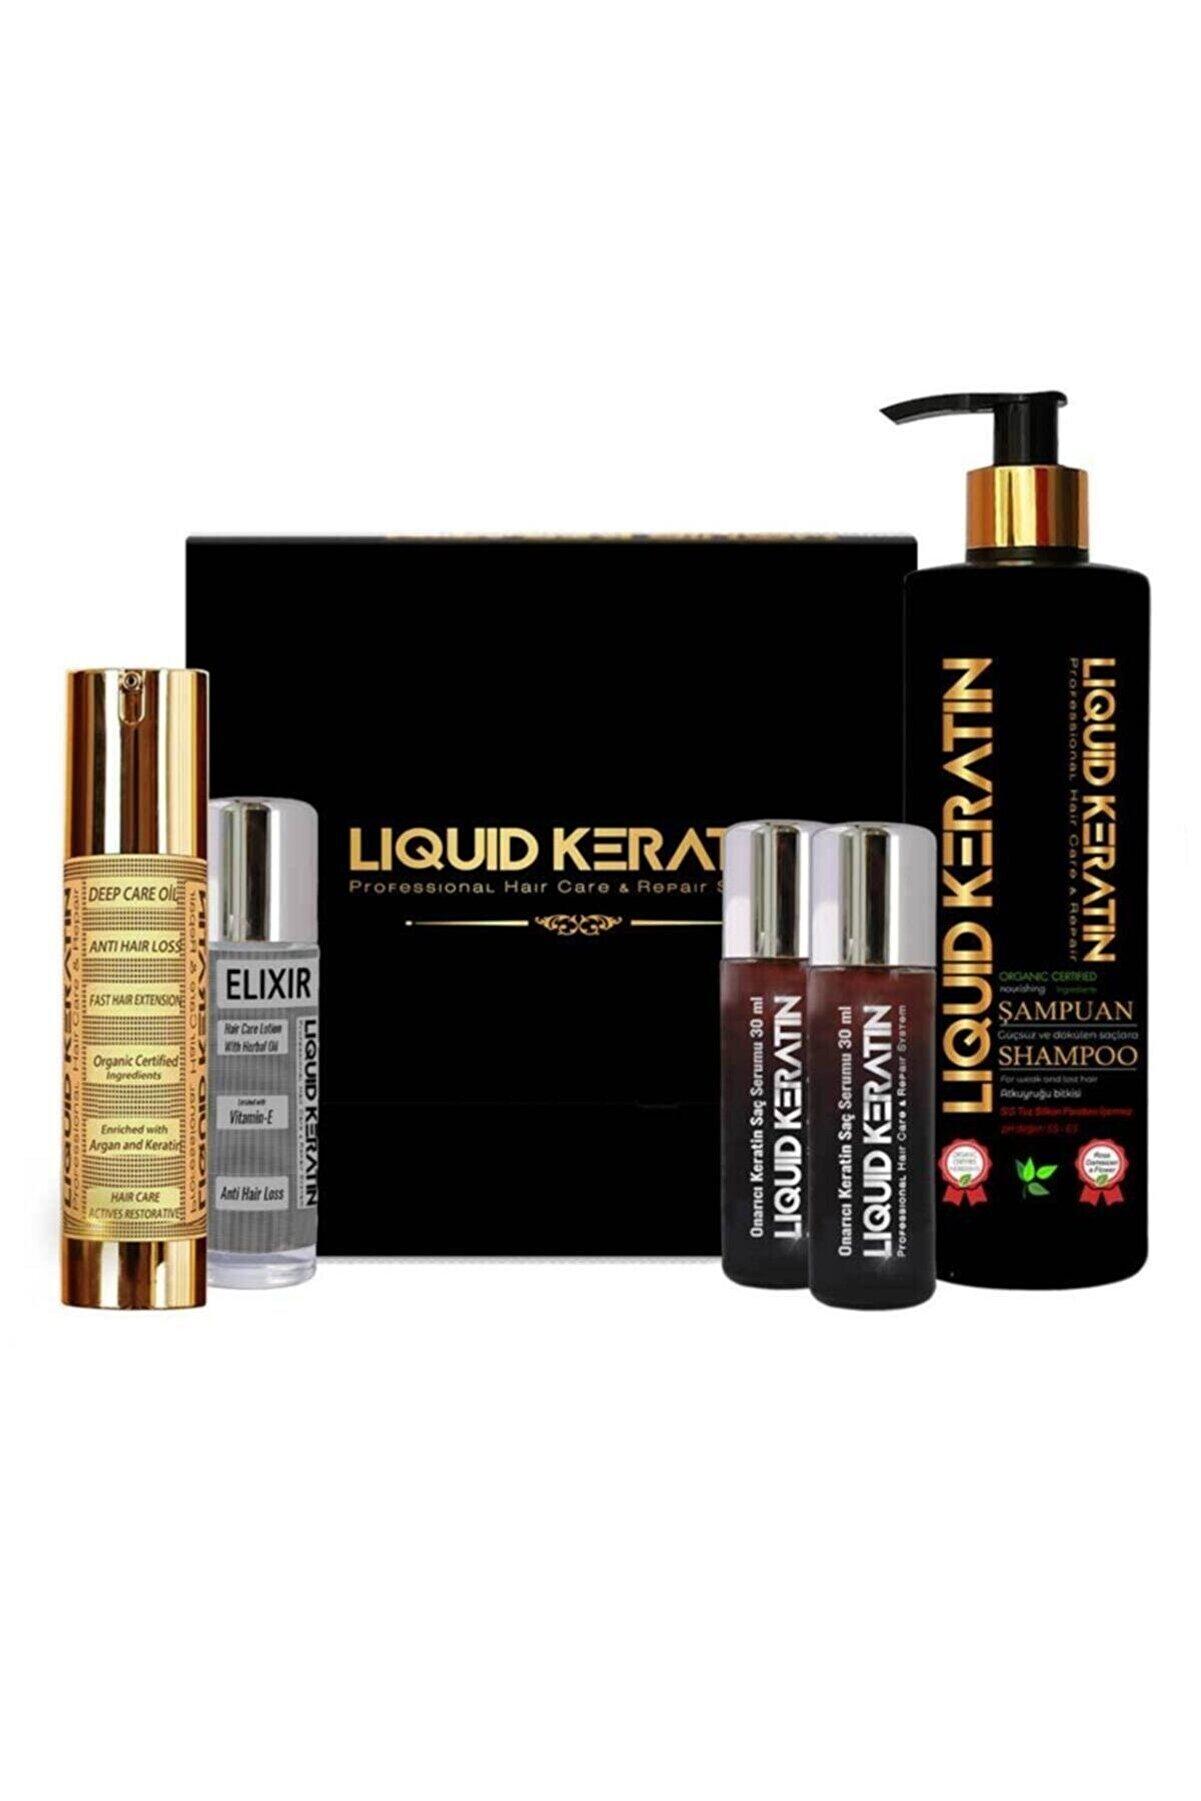 Liquid Keratin Keratin Hızlı Saç Uzatma Seti 5'li